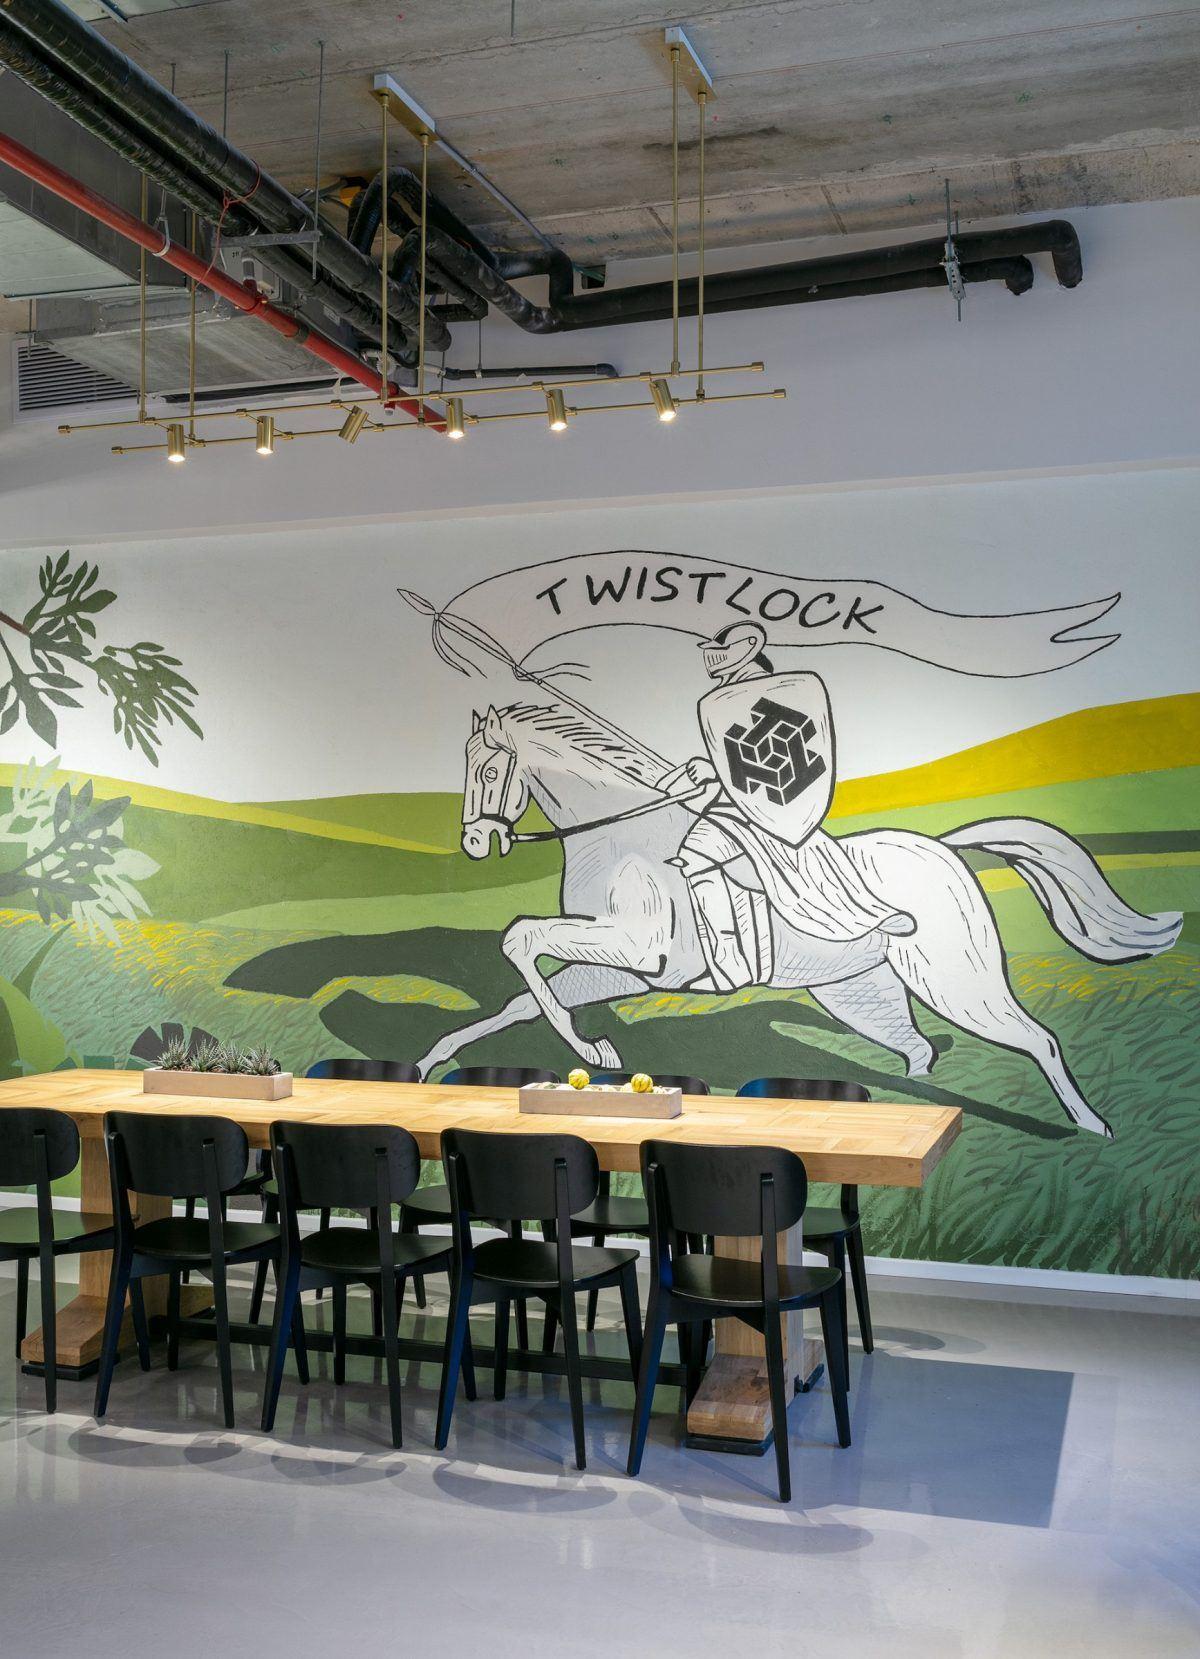 Twistlock Office Space גוף תאורה מיוחד מעל שולחן האוכל נעשה על ידי קמחי דורי